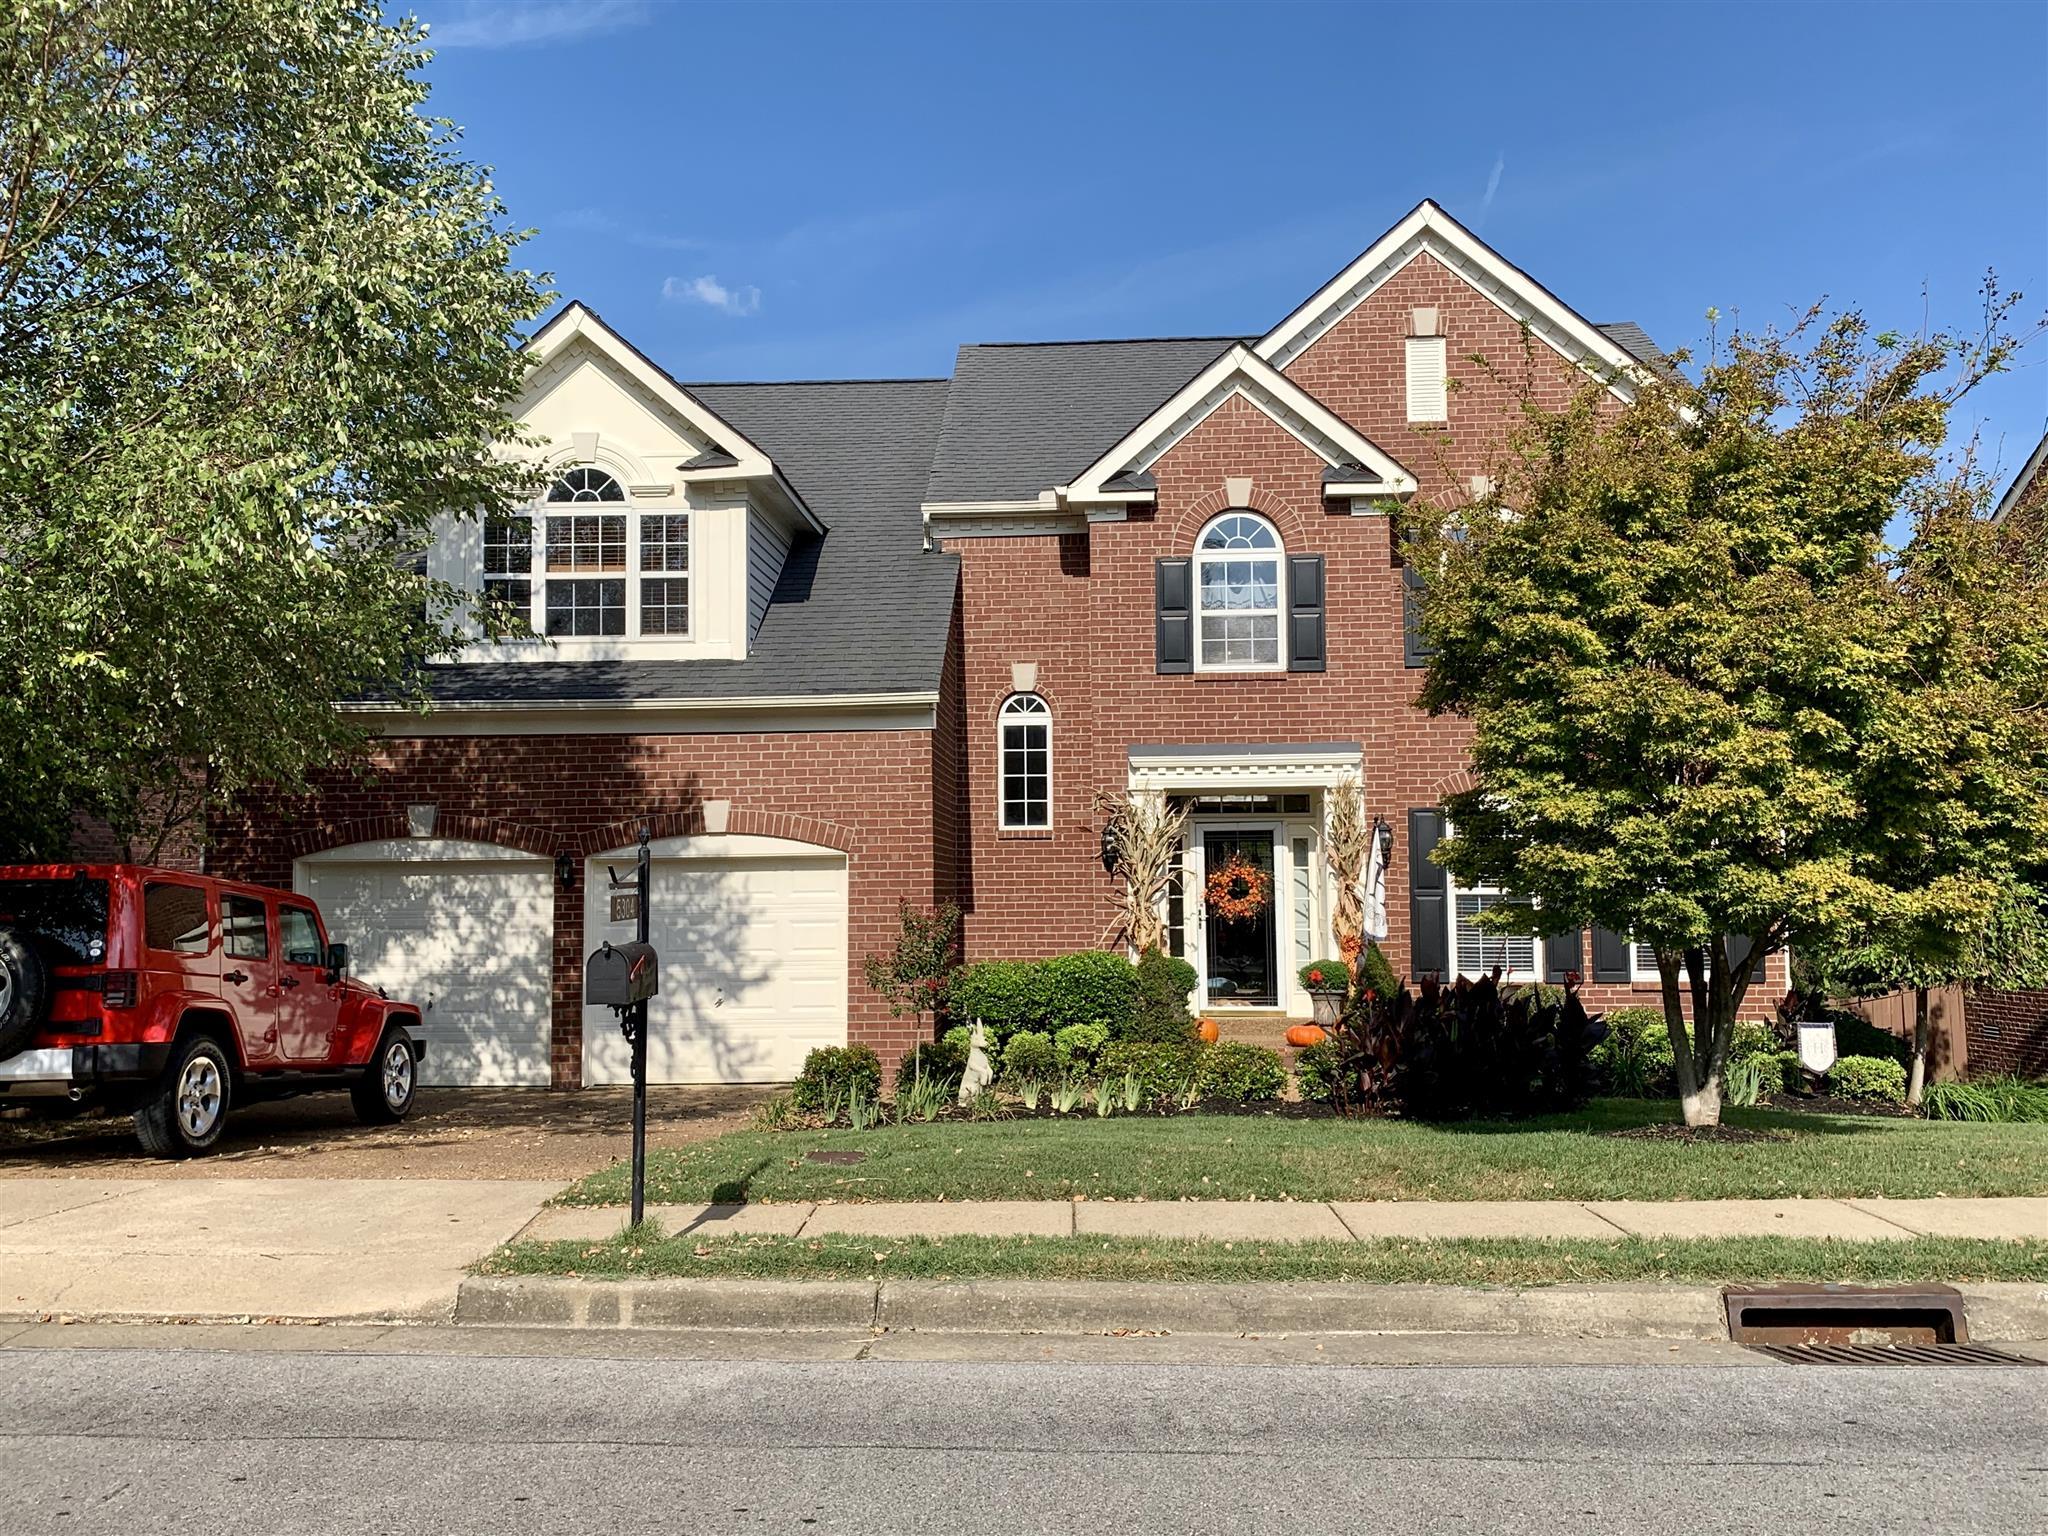 5304 Cochran Dr, Nashville, TN 37220 - Nashville, TN real estate listing